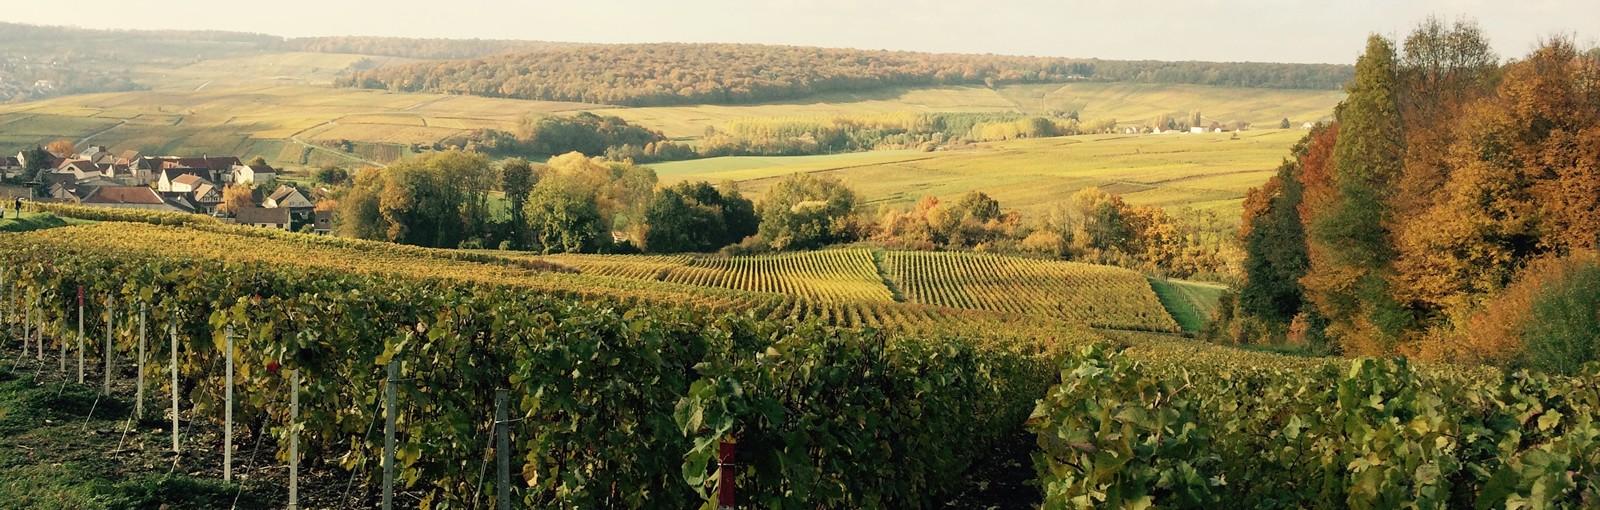 Tours Champagne - Borgoña - Multi-régional - Circuitos desde Paris